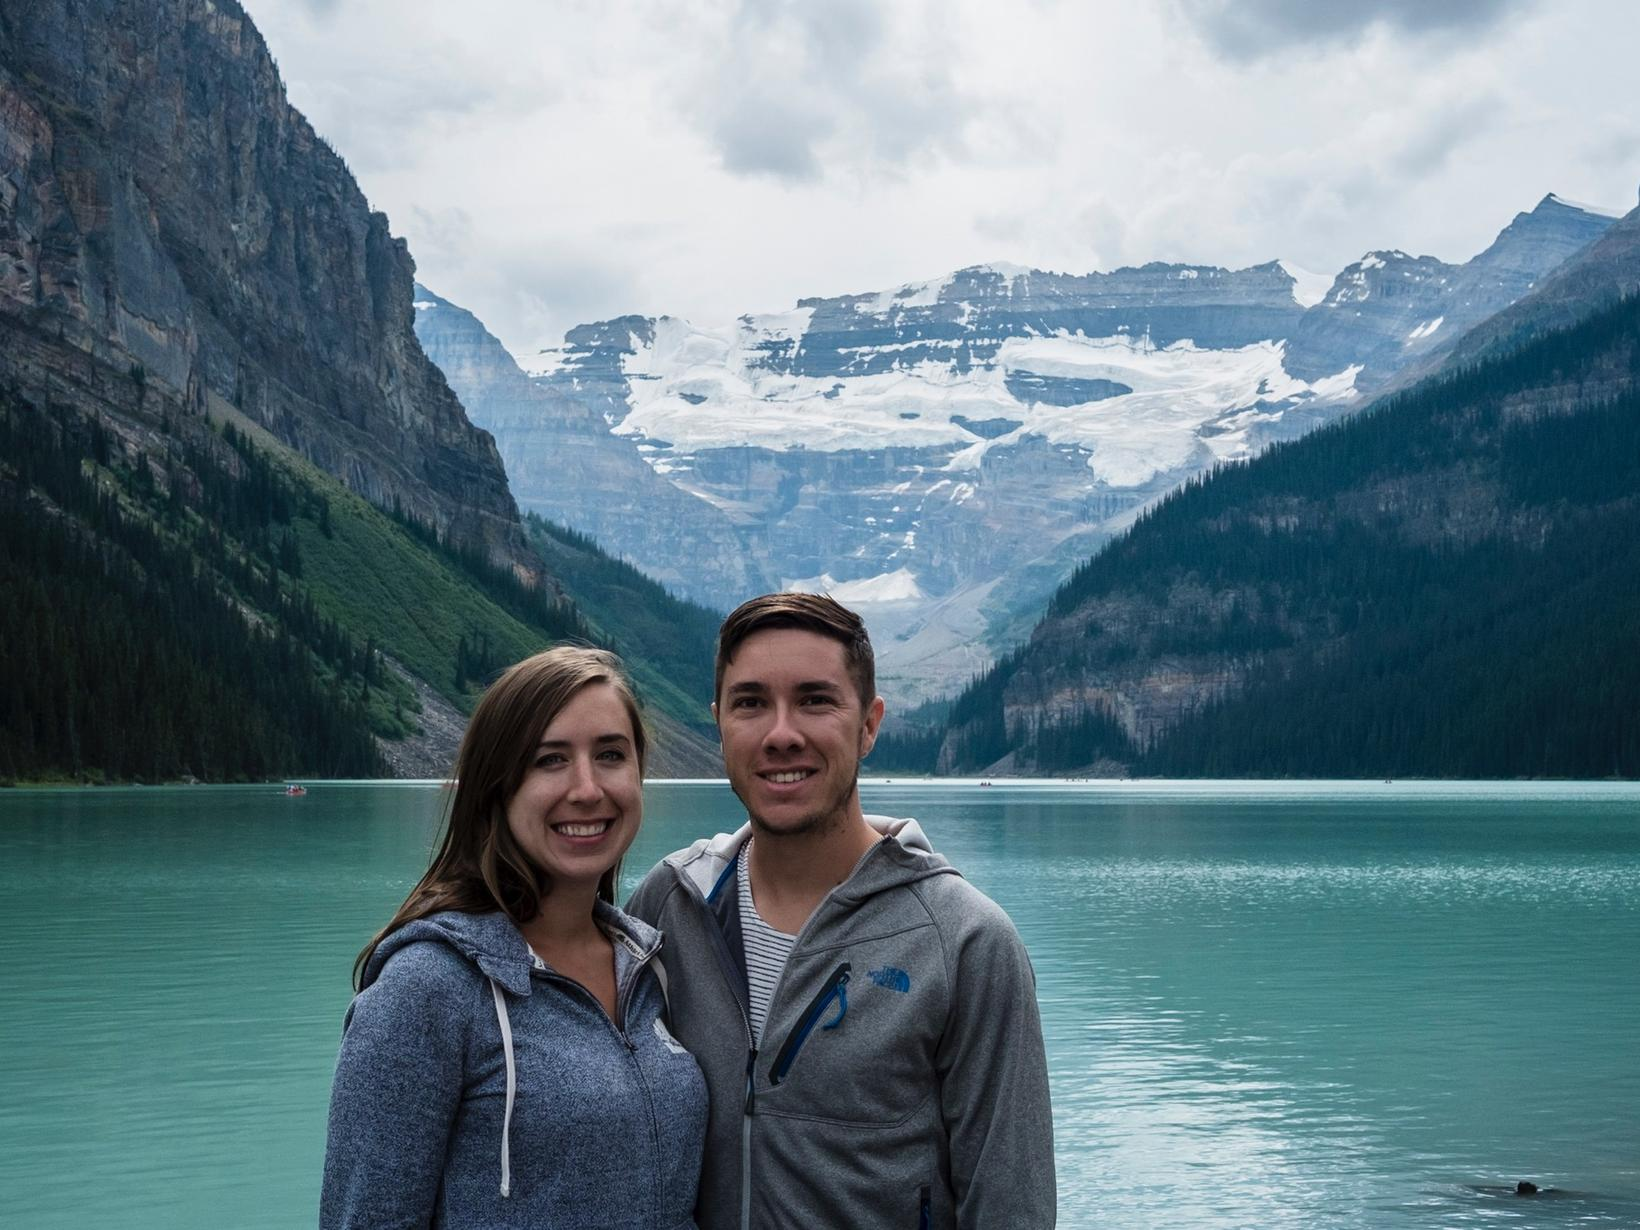 Jeff & Christina from Reading, United Kingdom